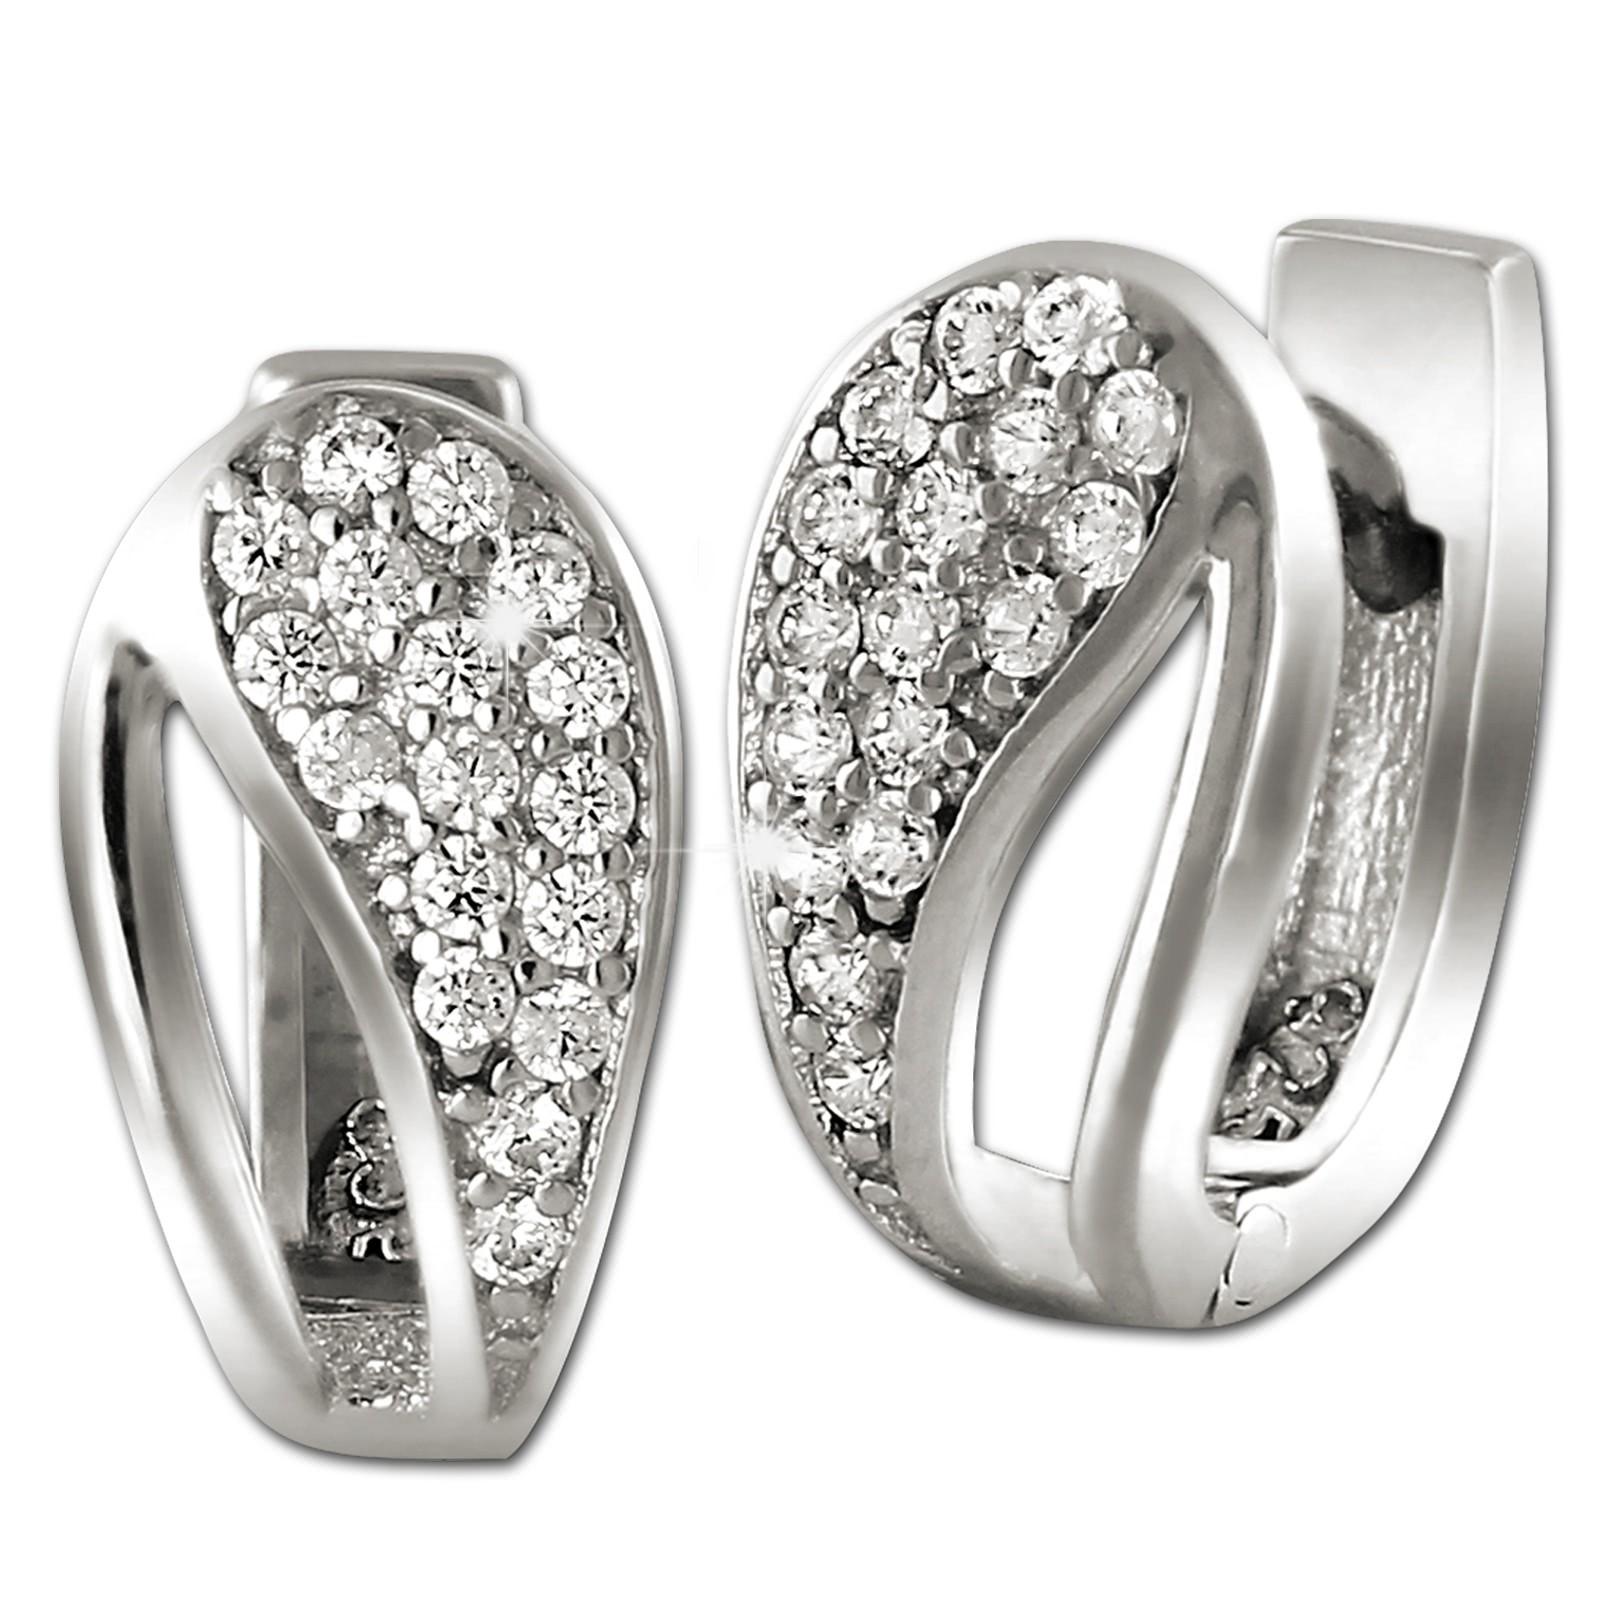 SilberDream Creole Blattform Zirkonia weiß 925 Sterling Silber Damen SDO4326W